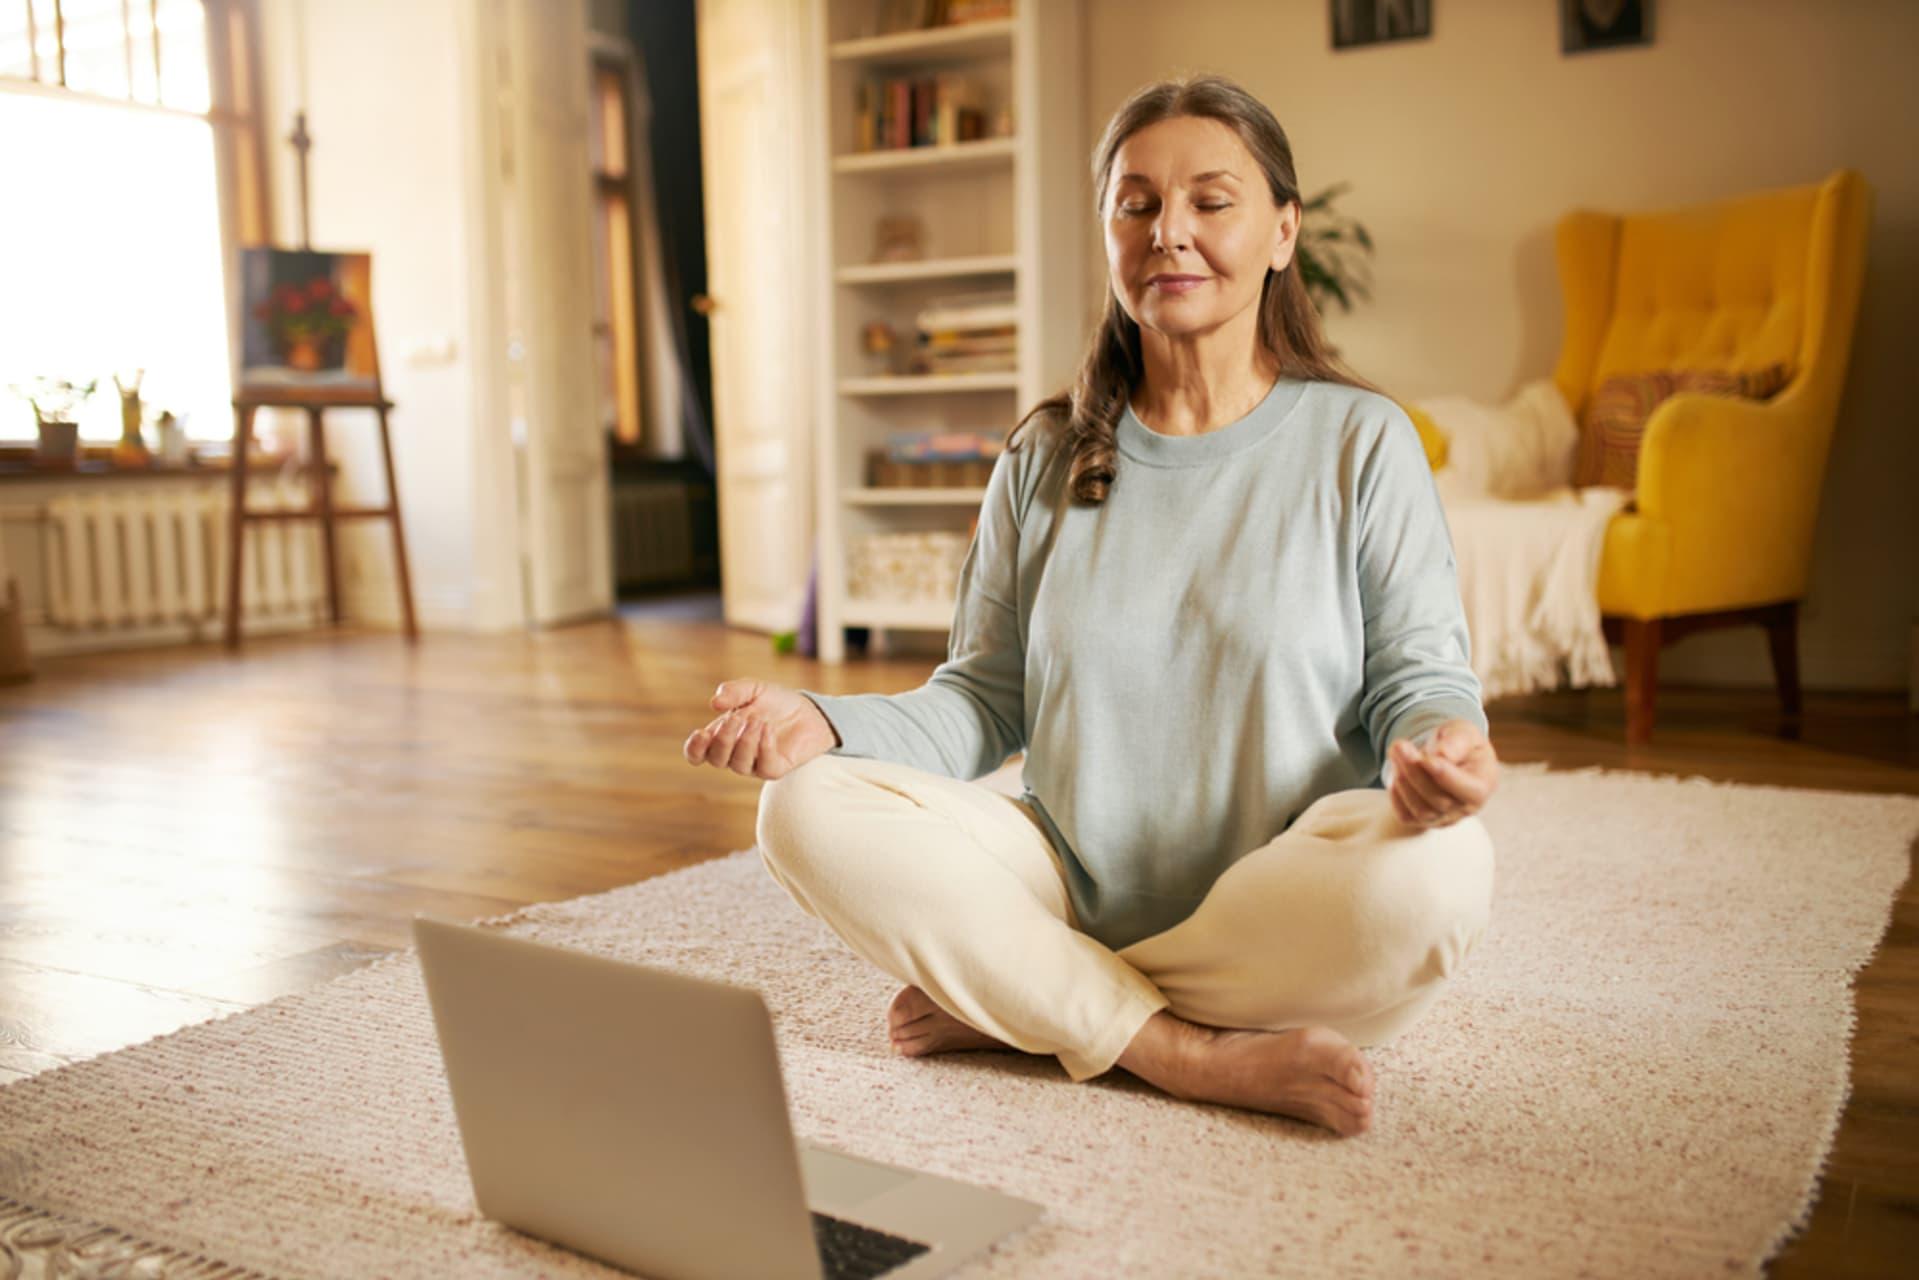 Torres Vedras - Meditation and Remote Reiki Healing Session